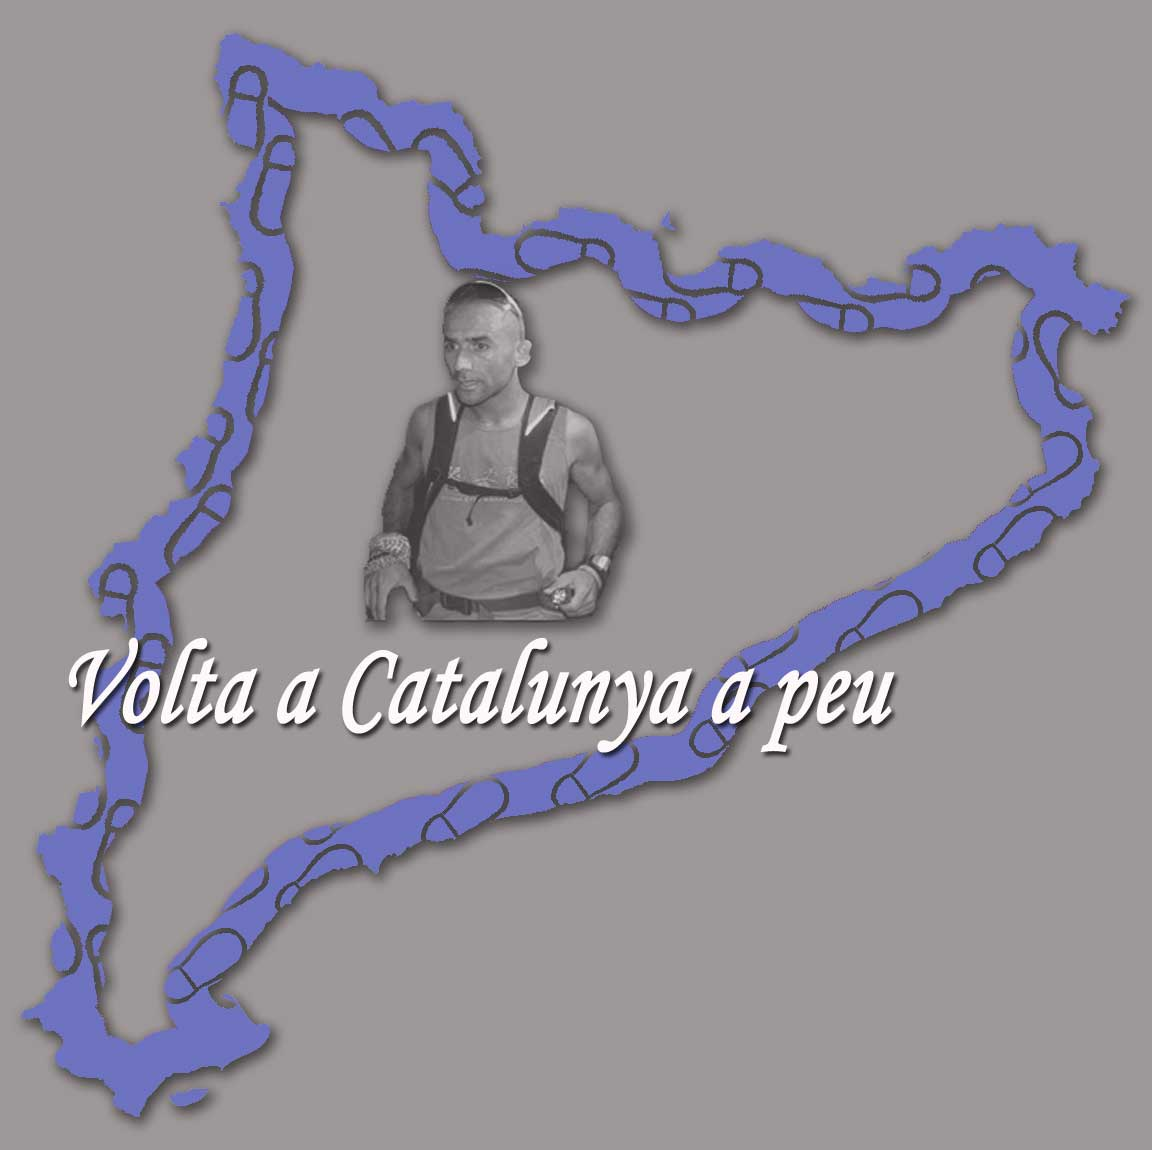 CORRIENDO POR LA SIERRA: VOLTA A CATALUNYA A PEU